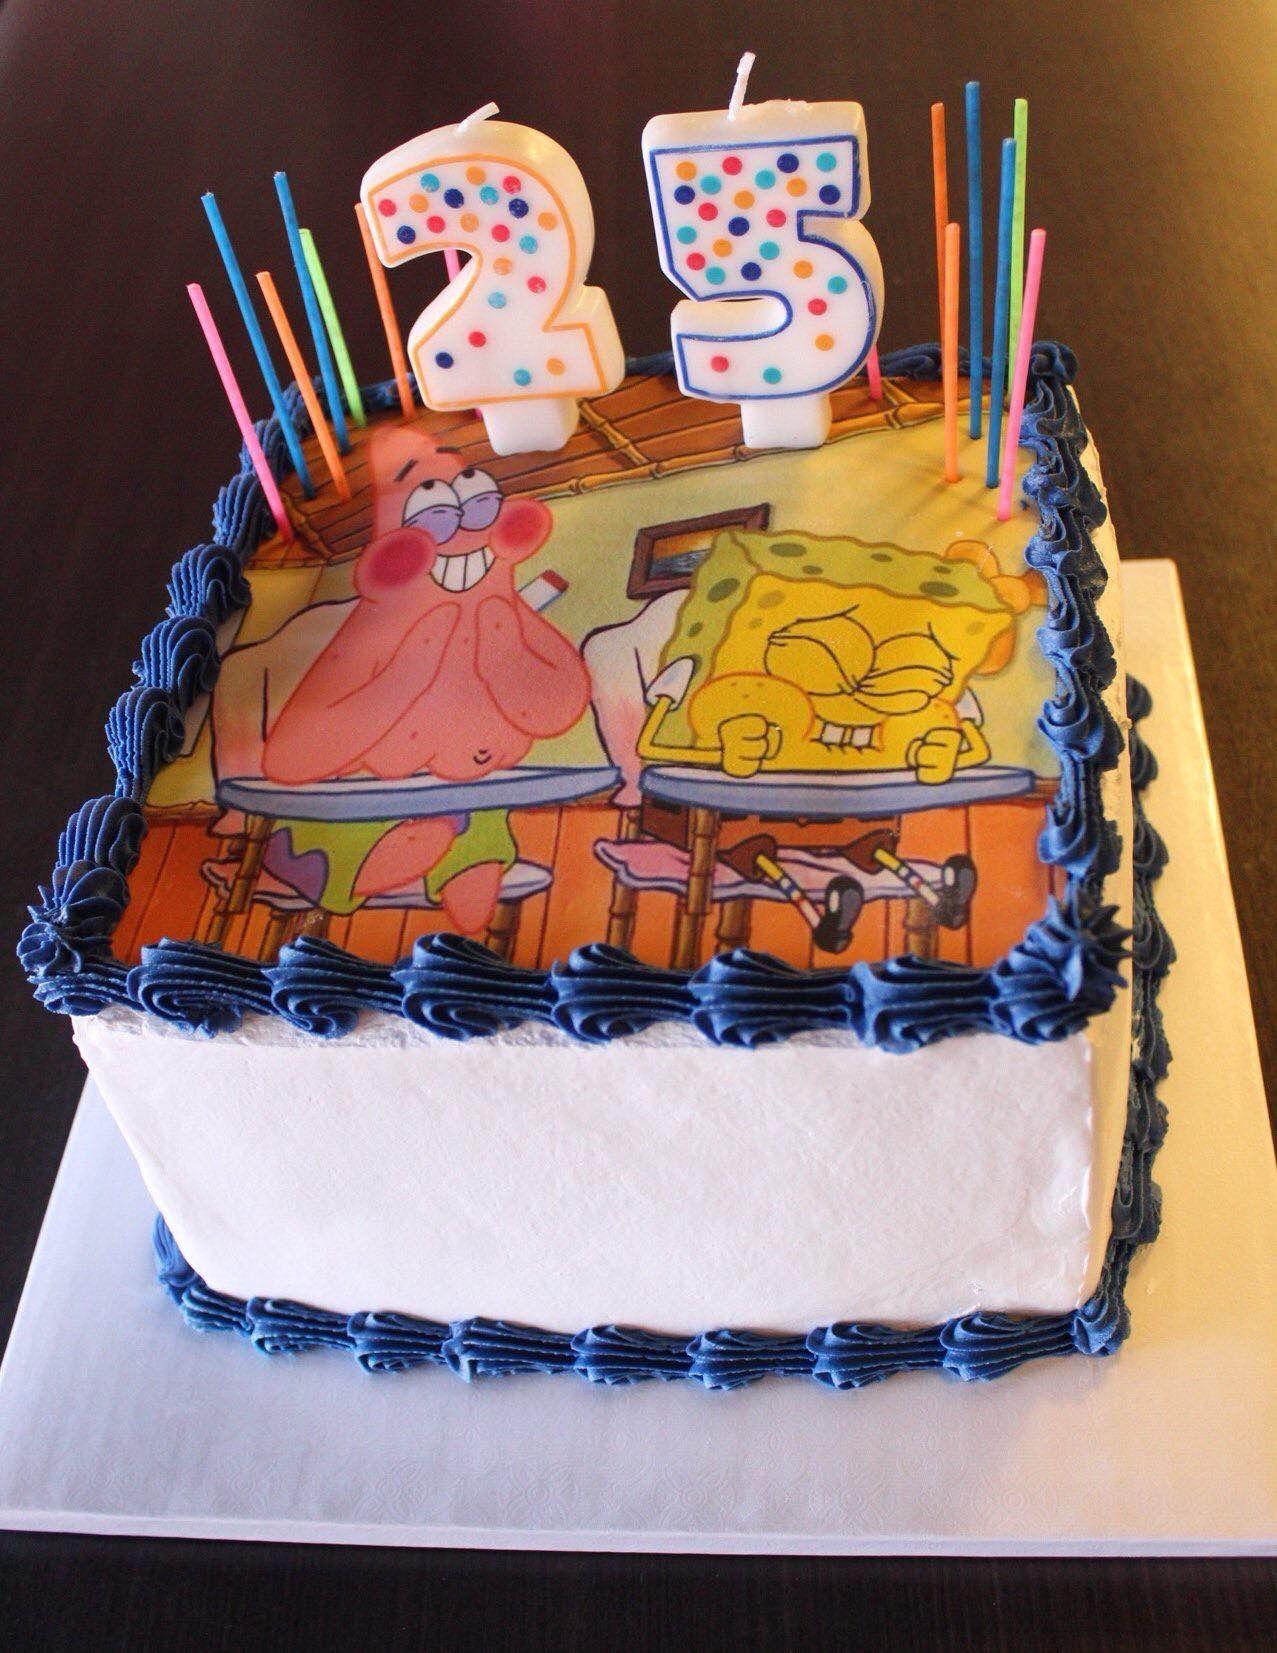 Spongebob Cake 25th Birthday Cakes Funny Birthday Cakes